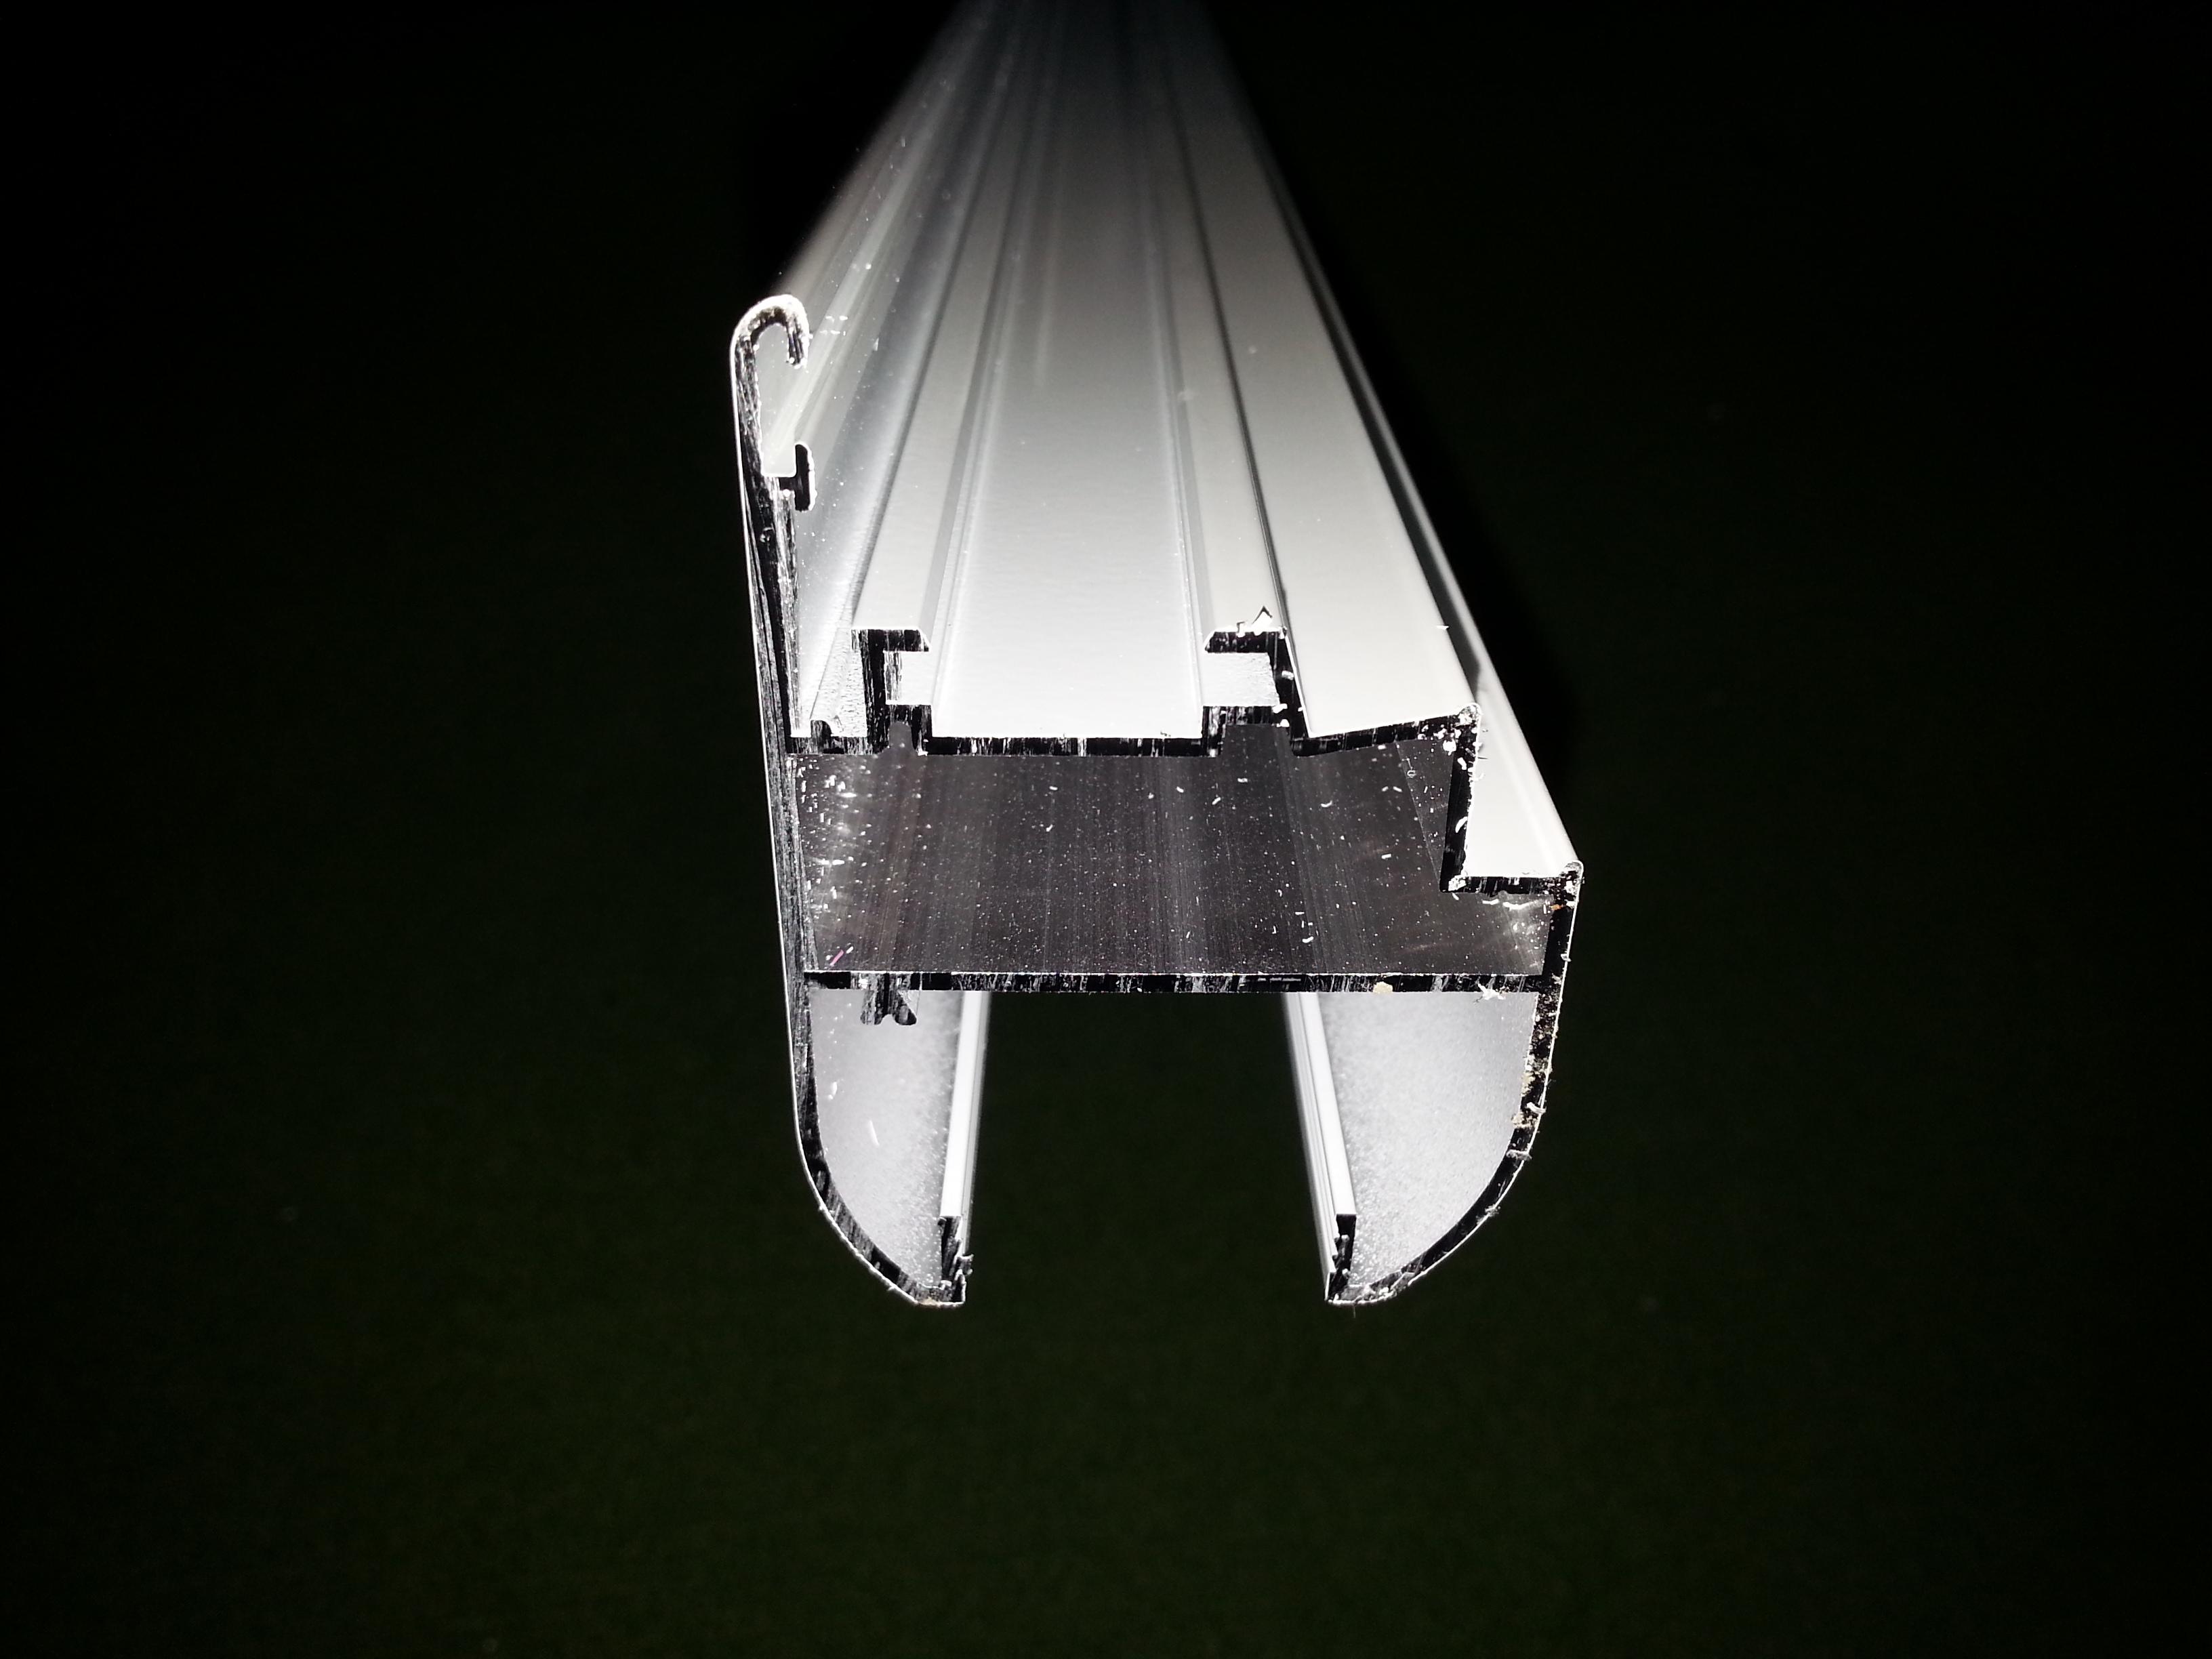 Serie practicable s 350 de alugom por ponsico s c p para for Perfiles de aluminio barcelona